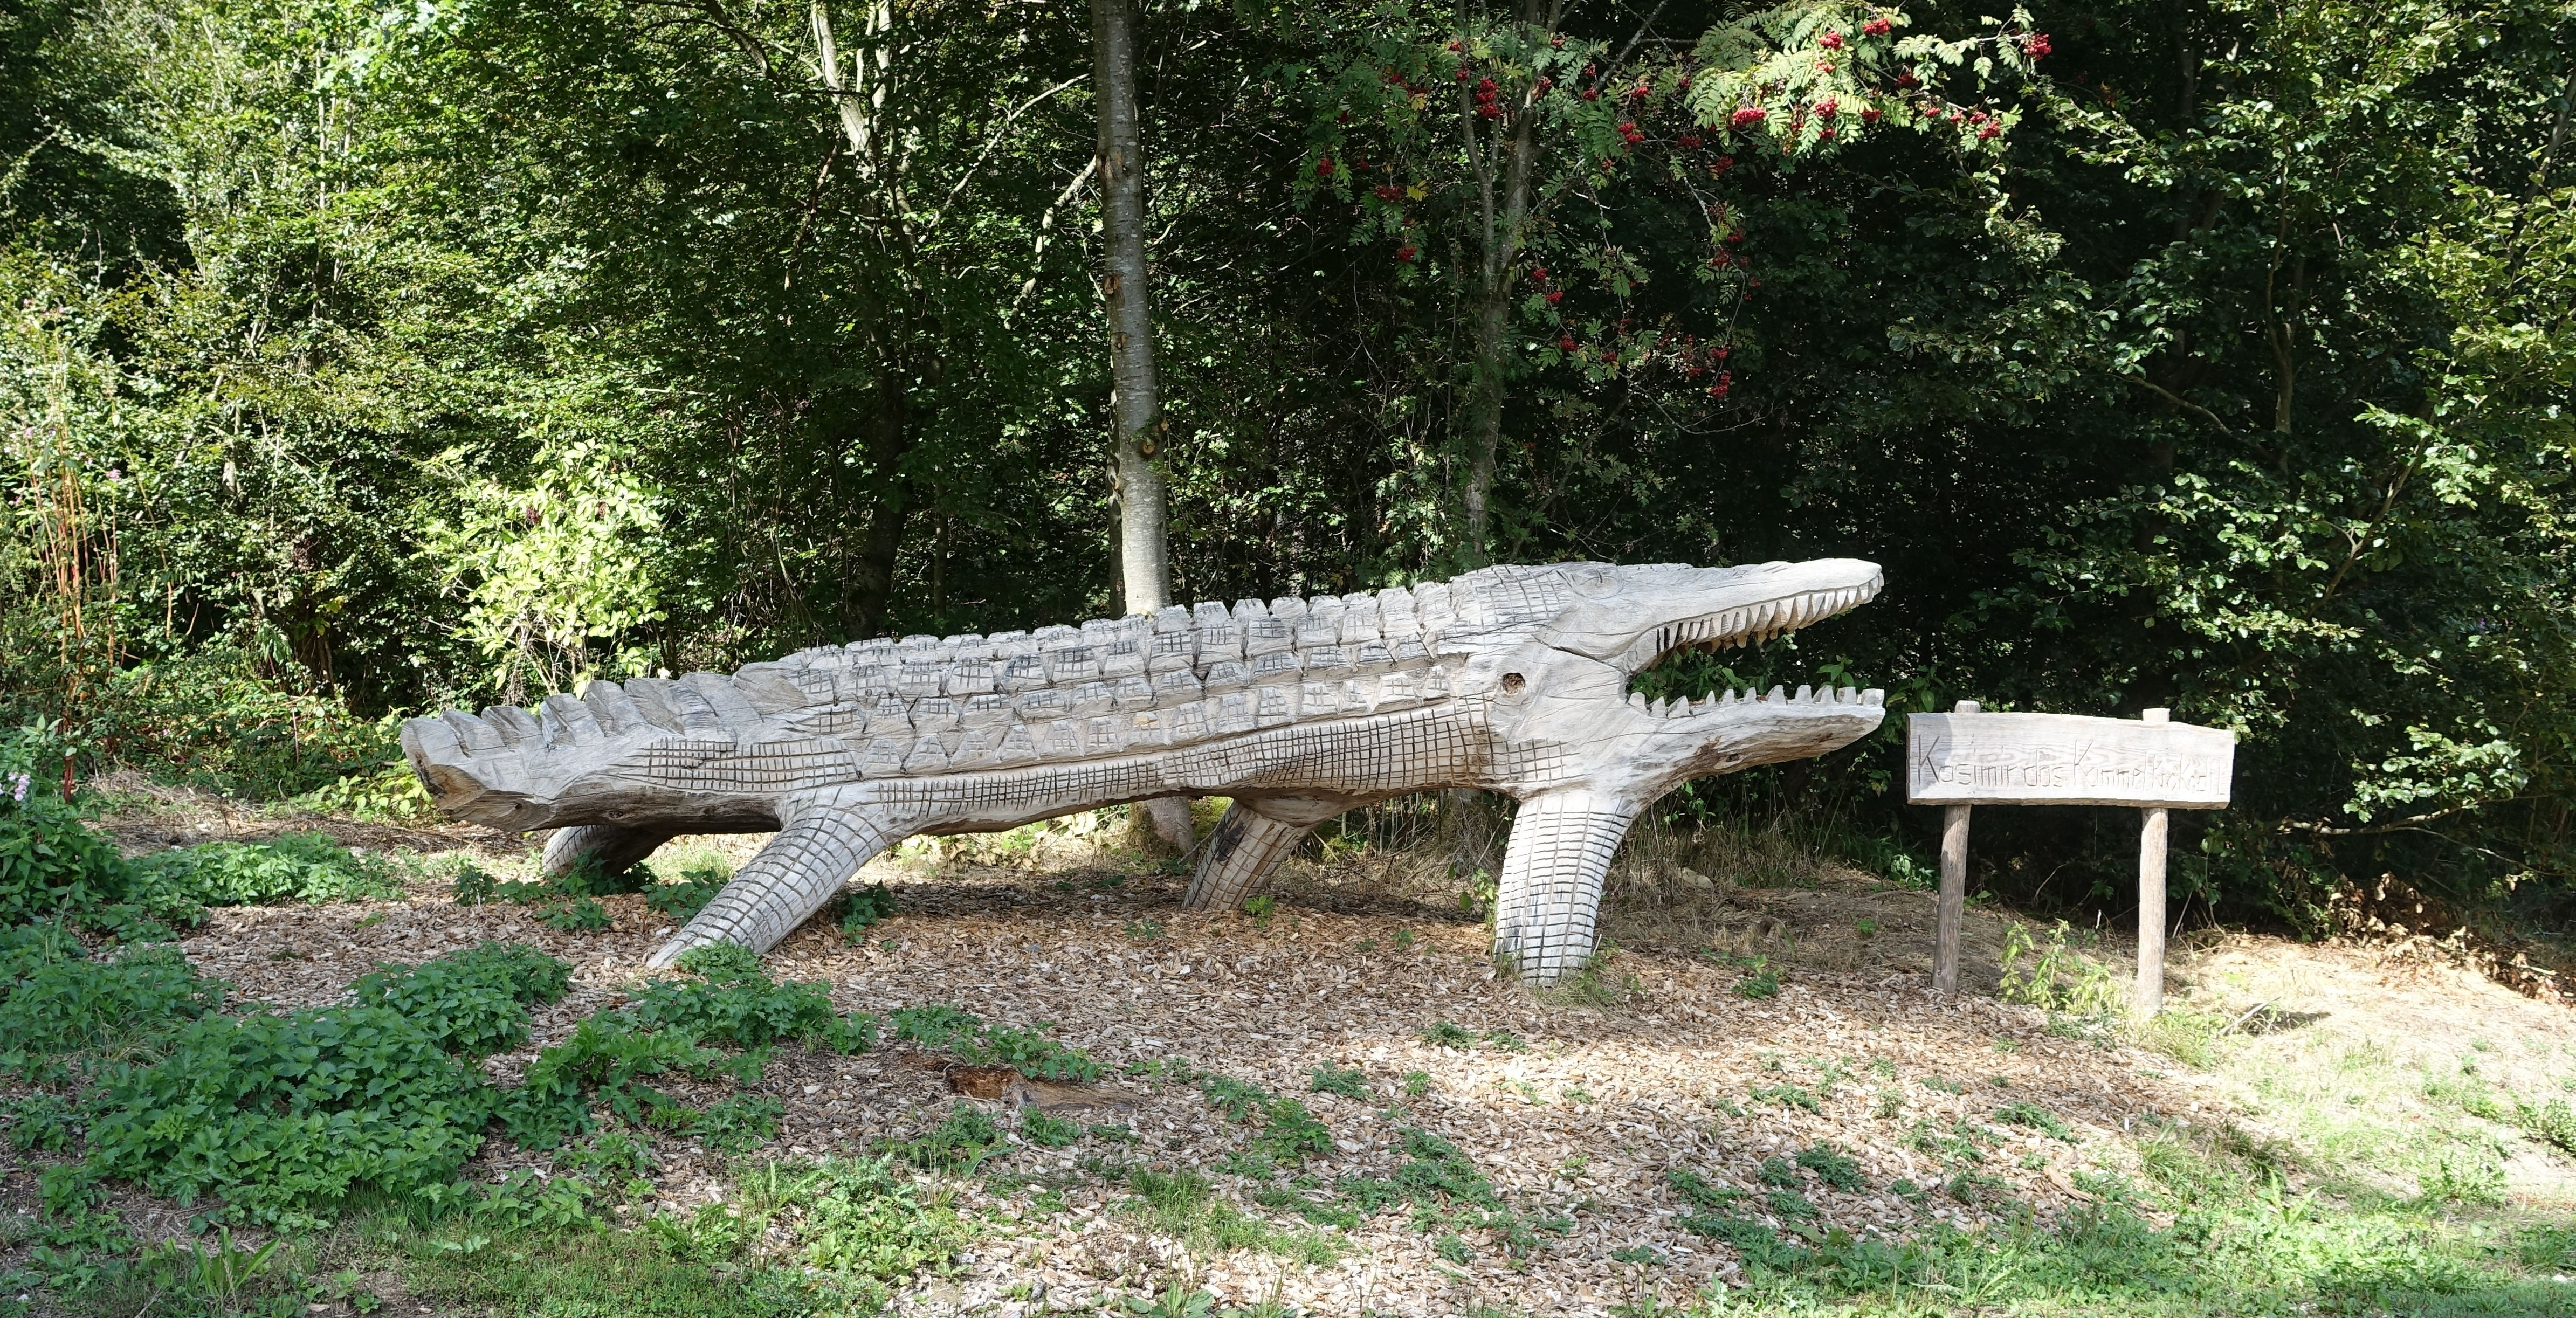 file krumbach krumbad holz skulptur krokodil im waldgebiet jpg wikimedia commons. Black Bedroom Furniture Sets. Home Design Ideas